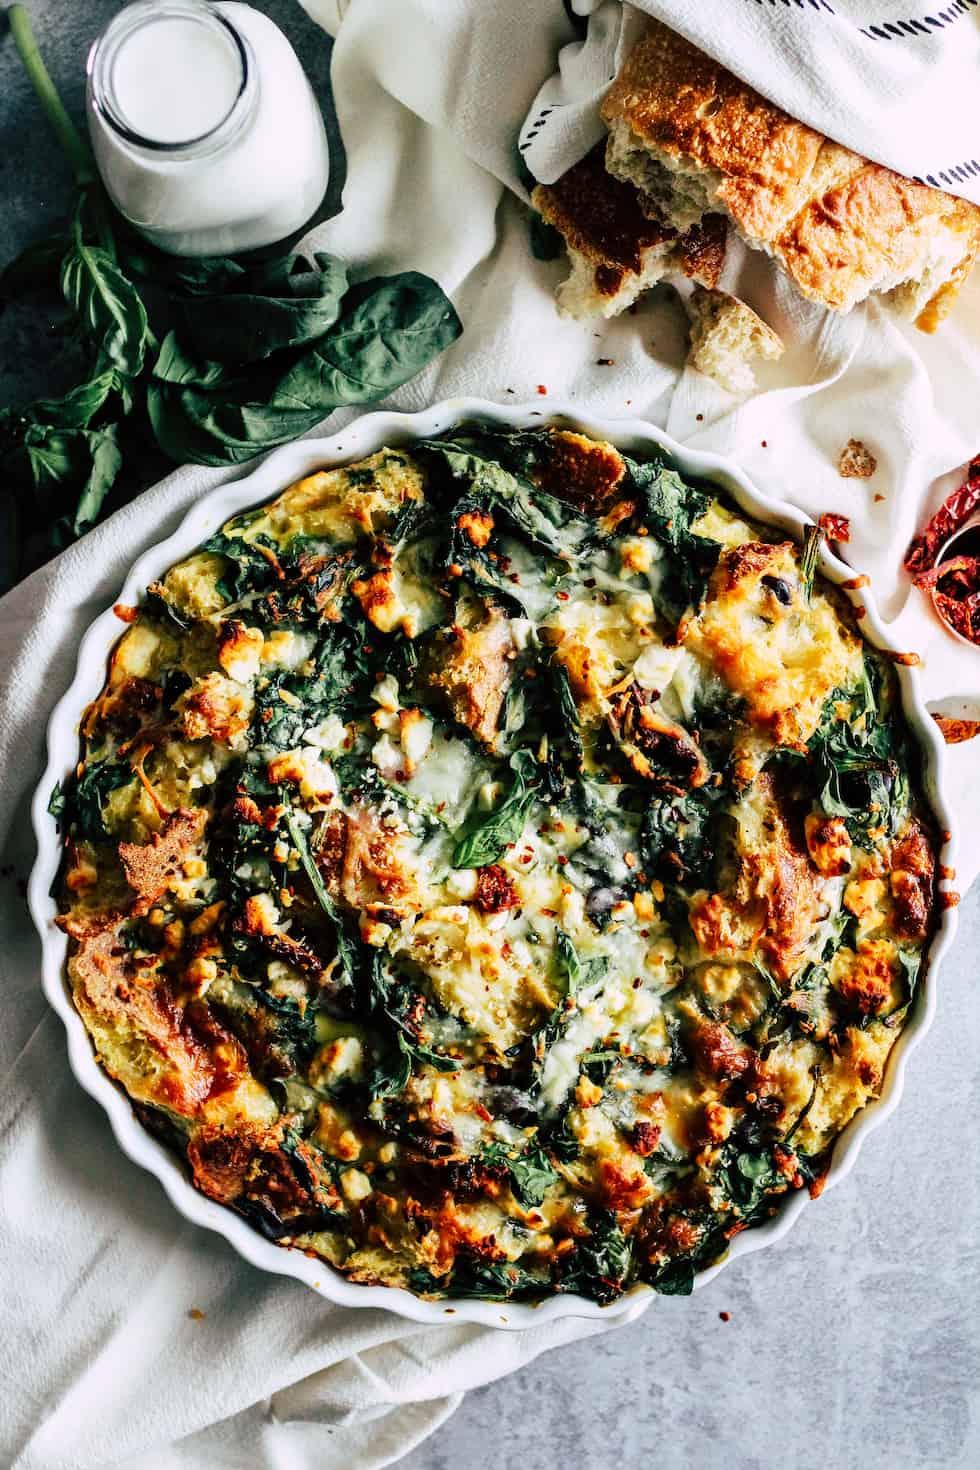 Vegetarian Strata in white pie dish wtih bread and fresh herbs.